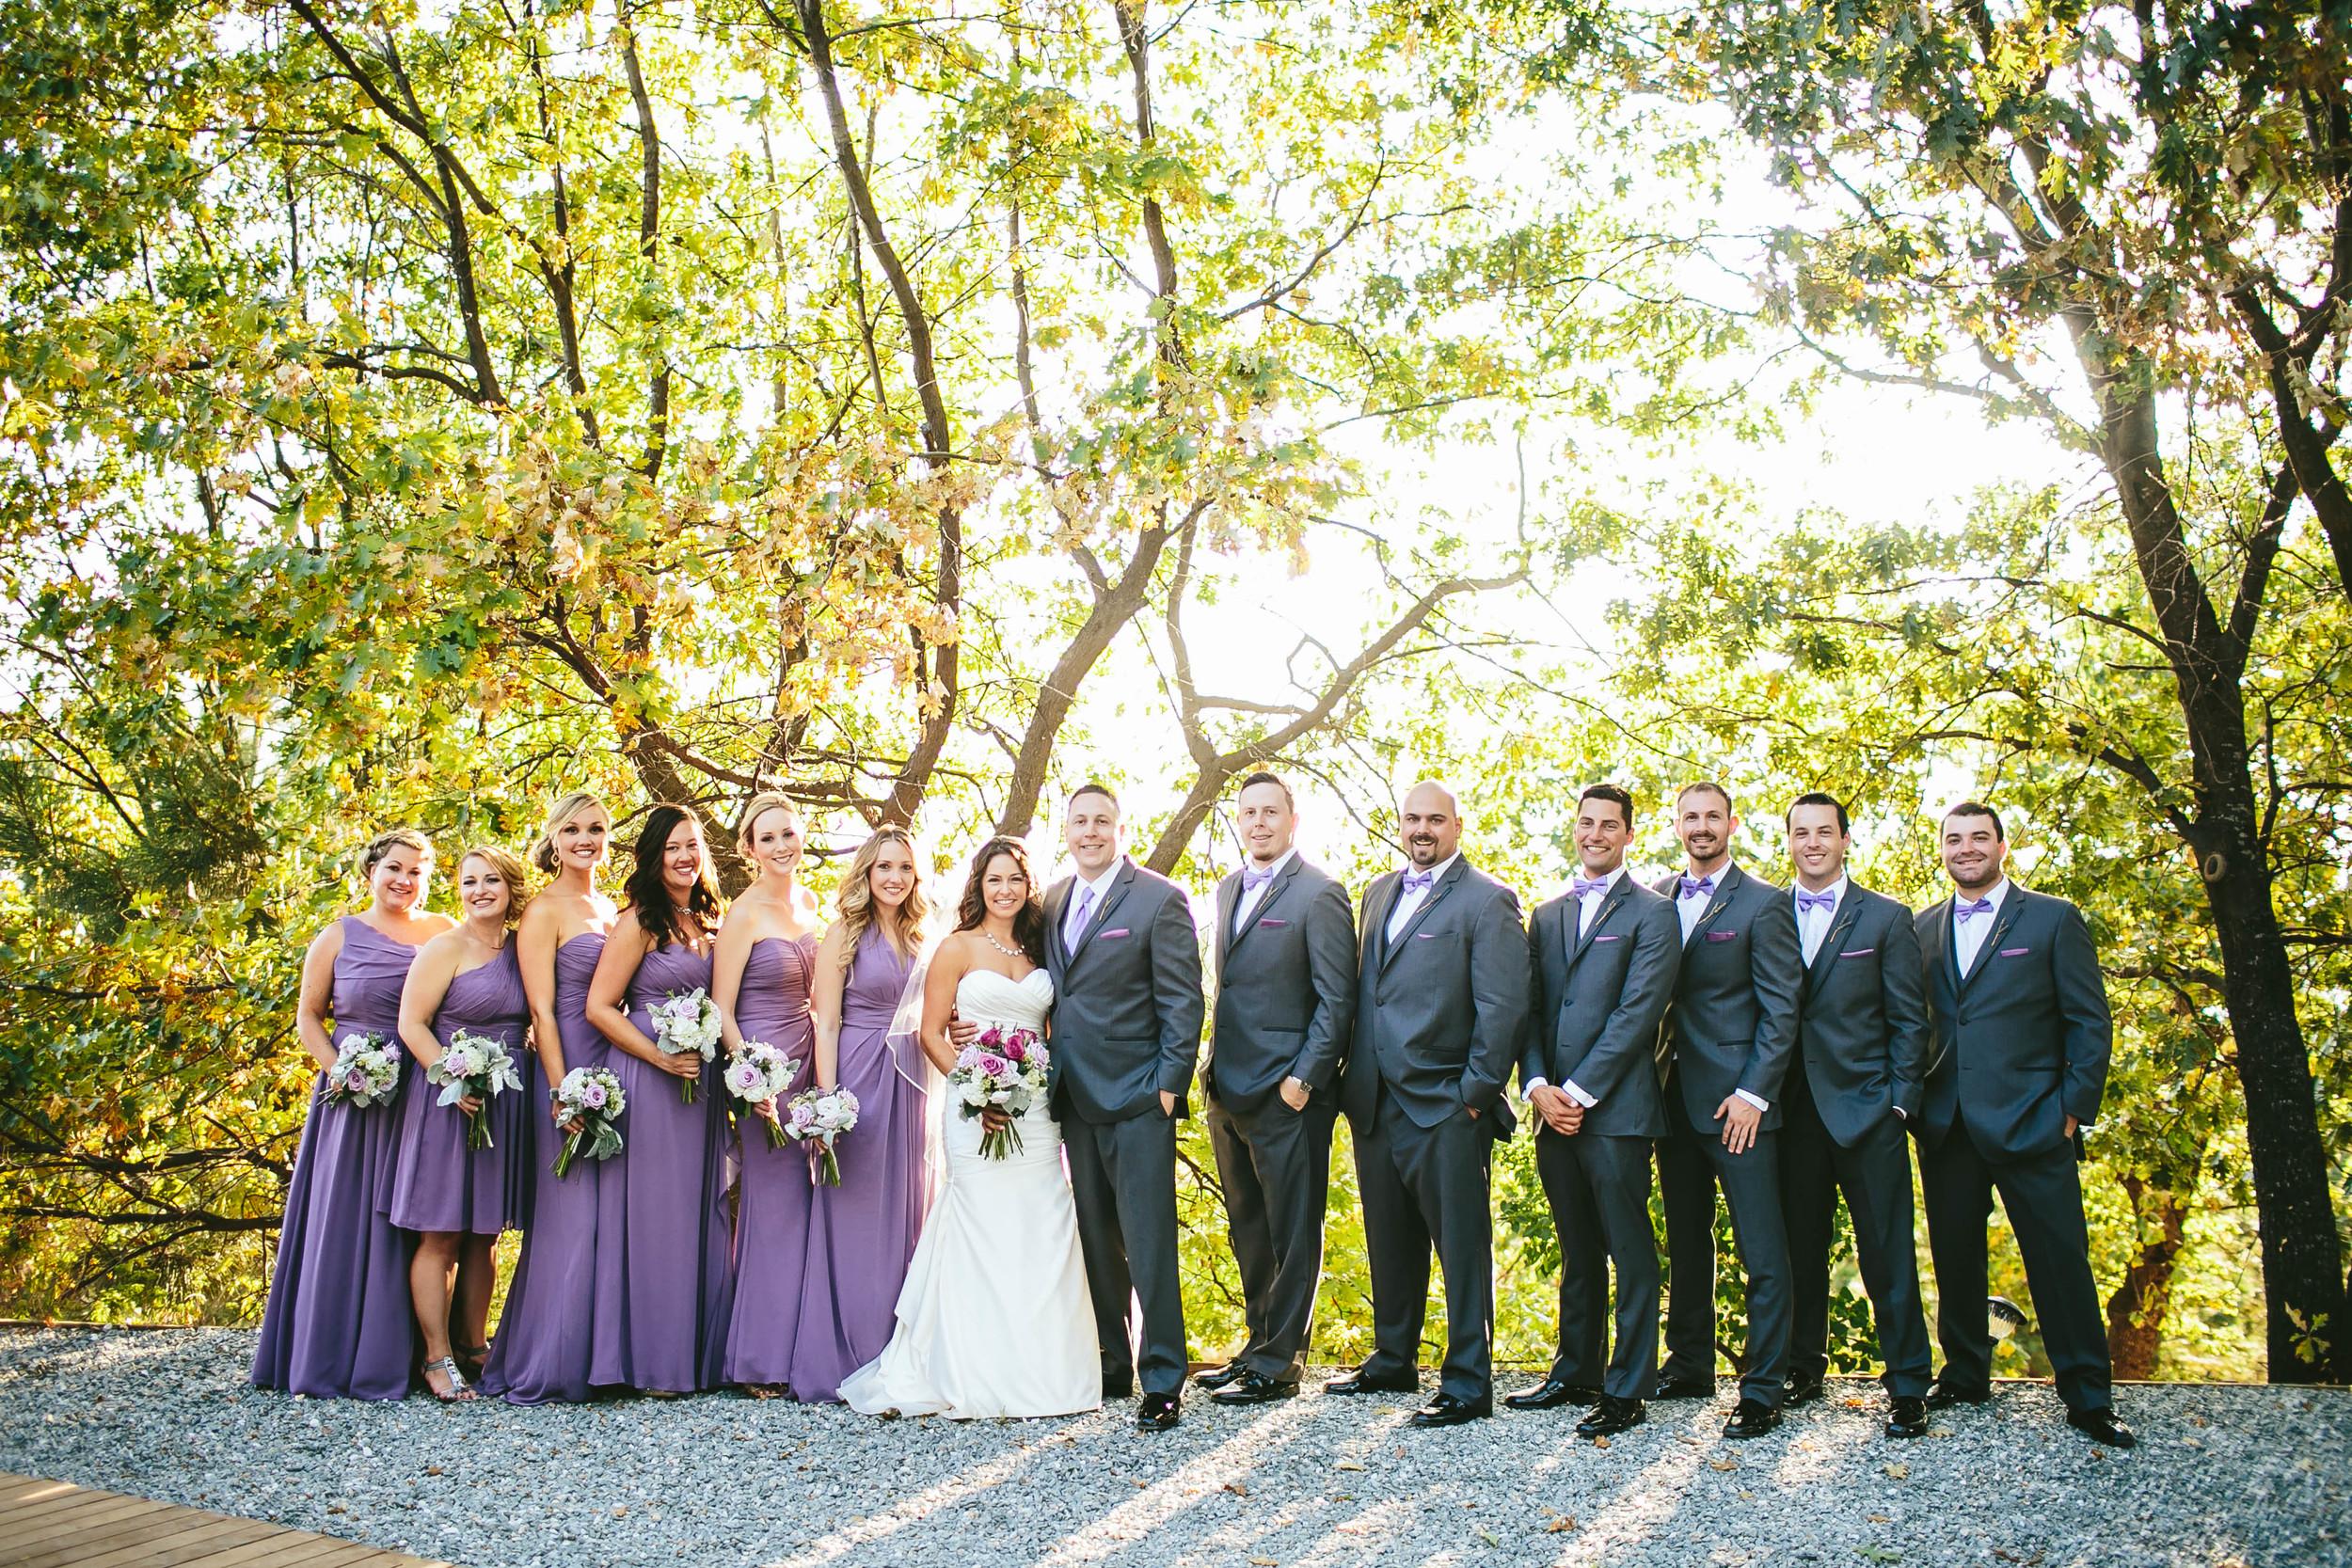 Elise+Matty-WEDDING_PRINT-410.jpg